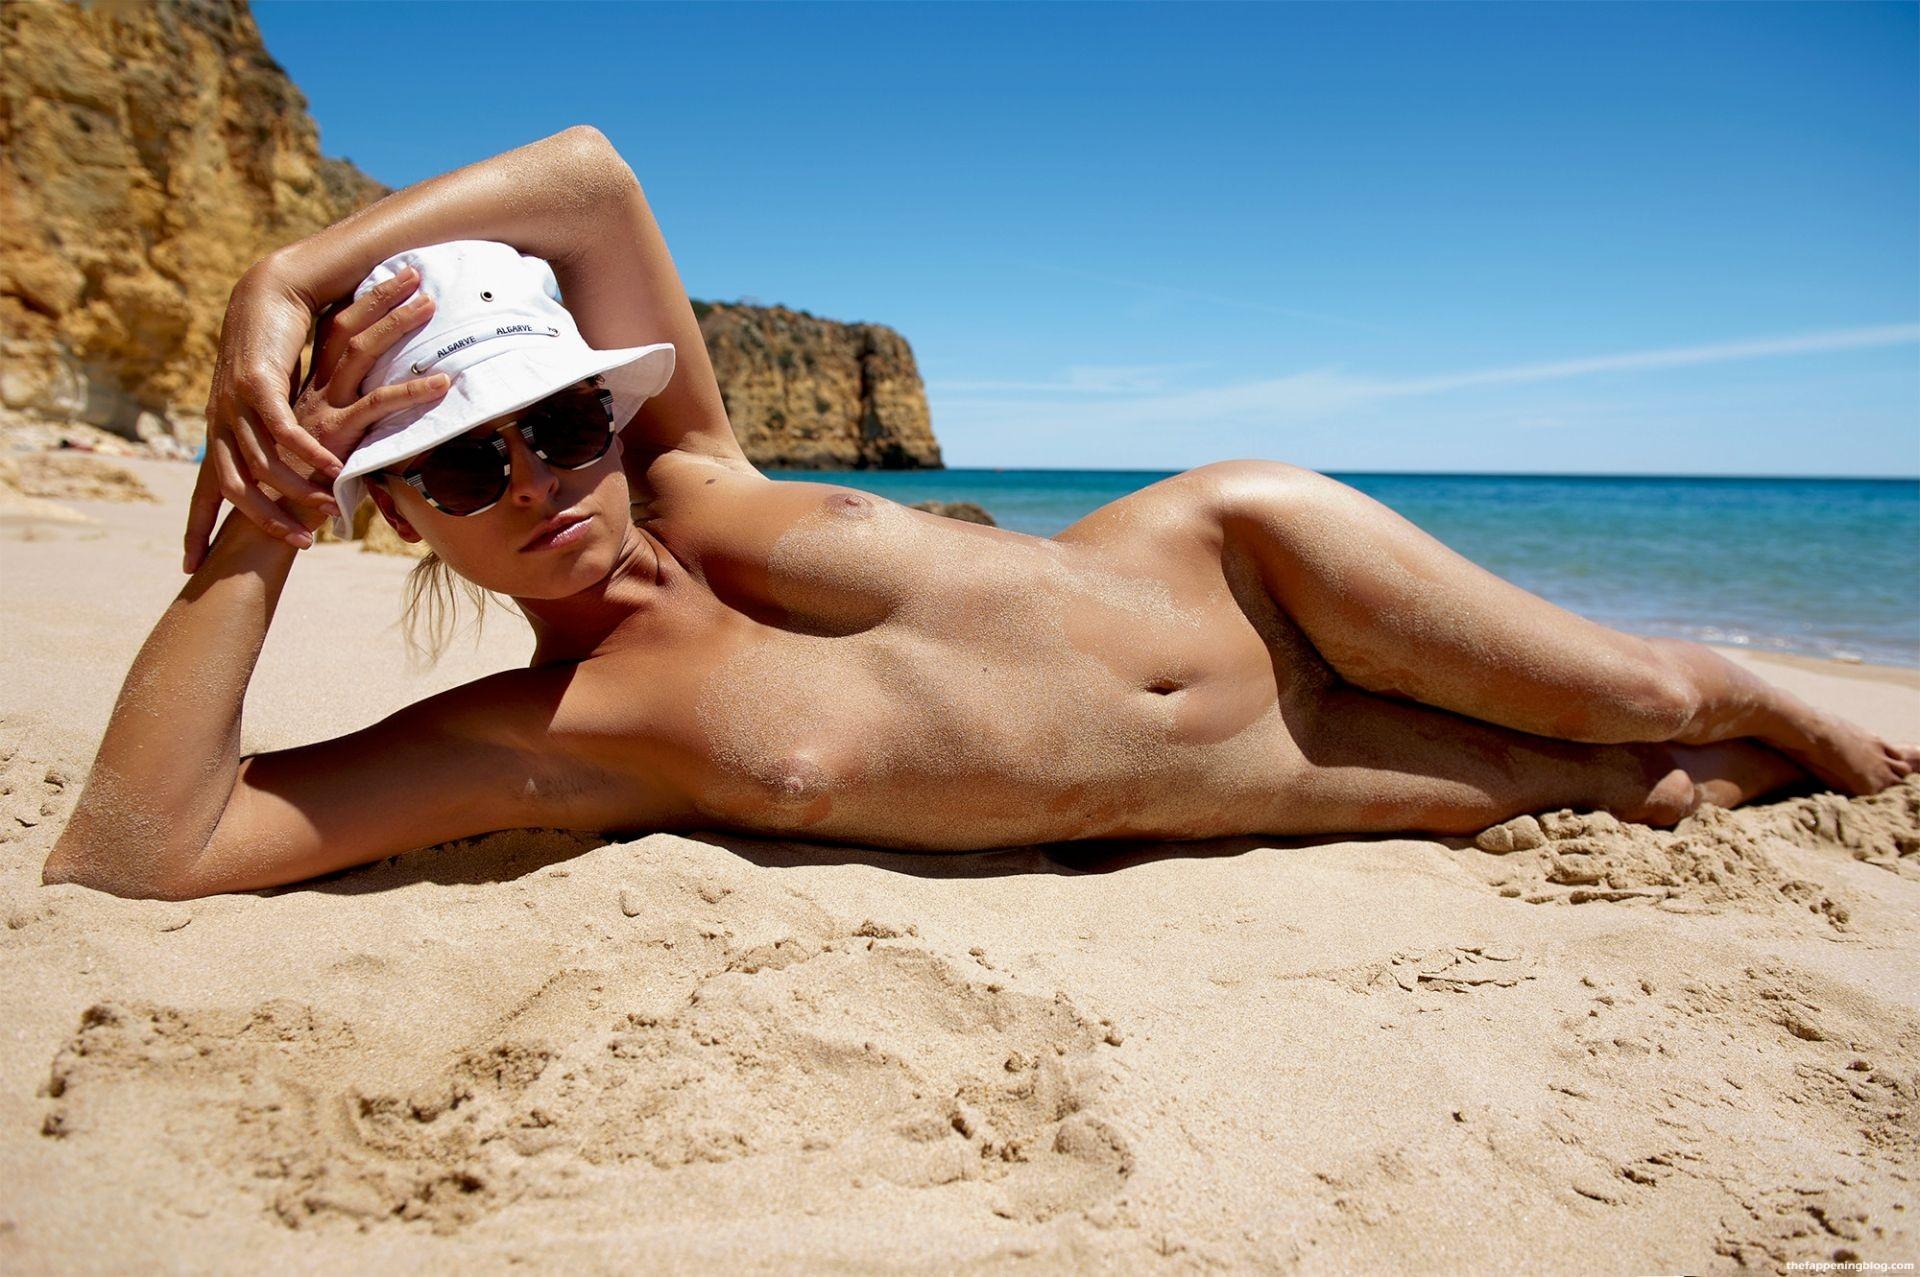 Marisa-Papen-Naked-14-thefappeningblog.com1_.jpg